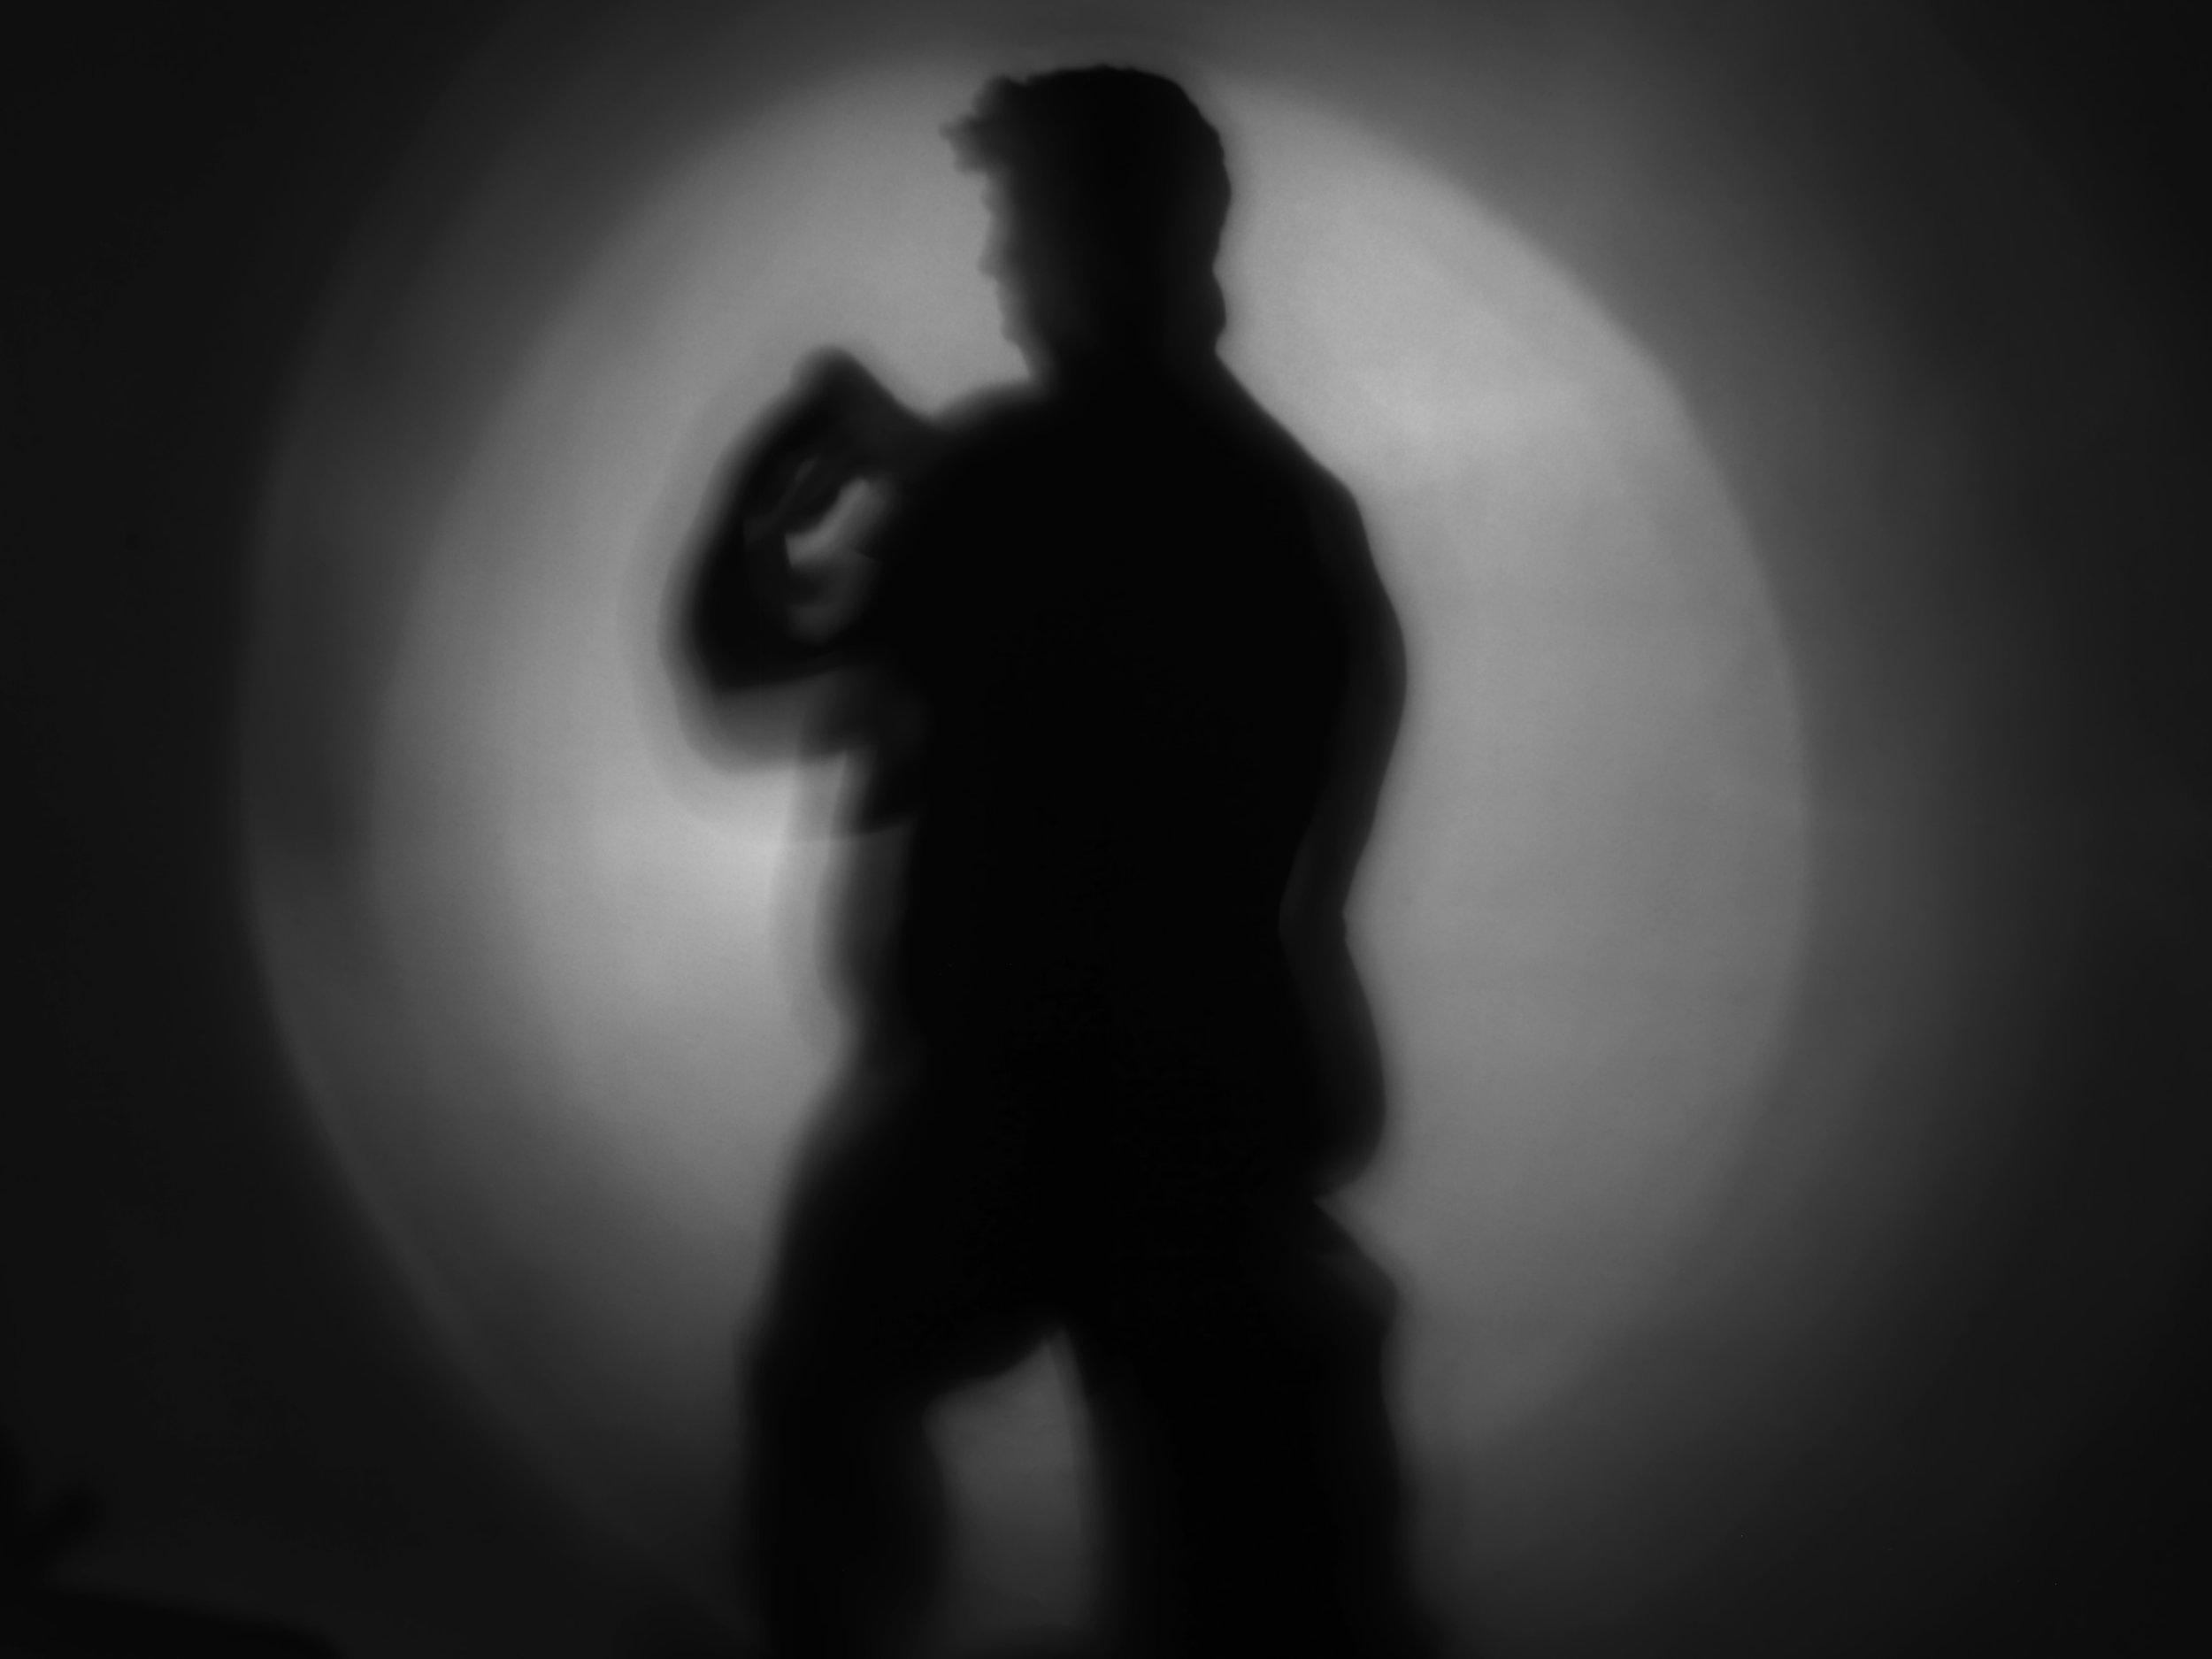 Lightand Shadow in the Future-QEP FINE ART 2018-Obesity-Marco Garofalo-Fine Art Photography-2018.jpg